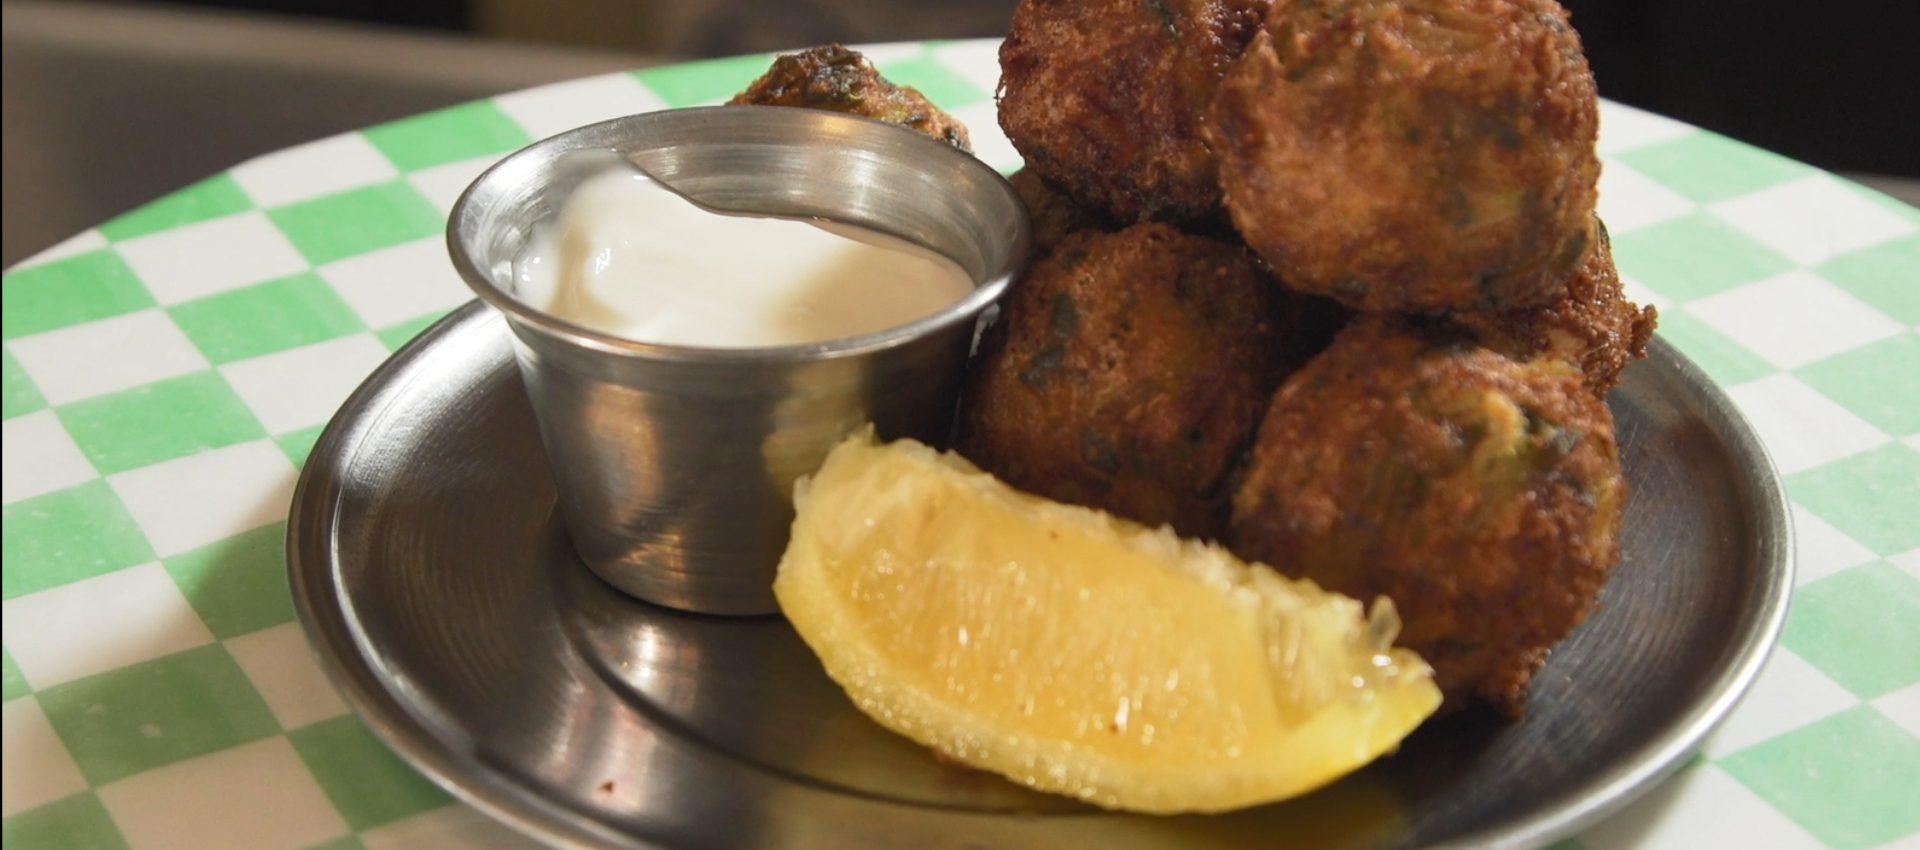 Foto: cucinare.tv